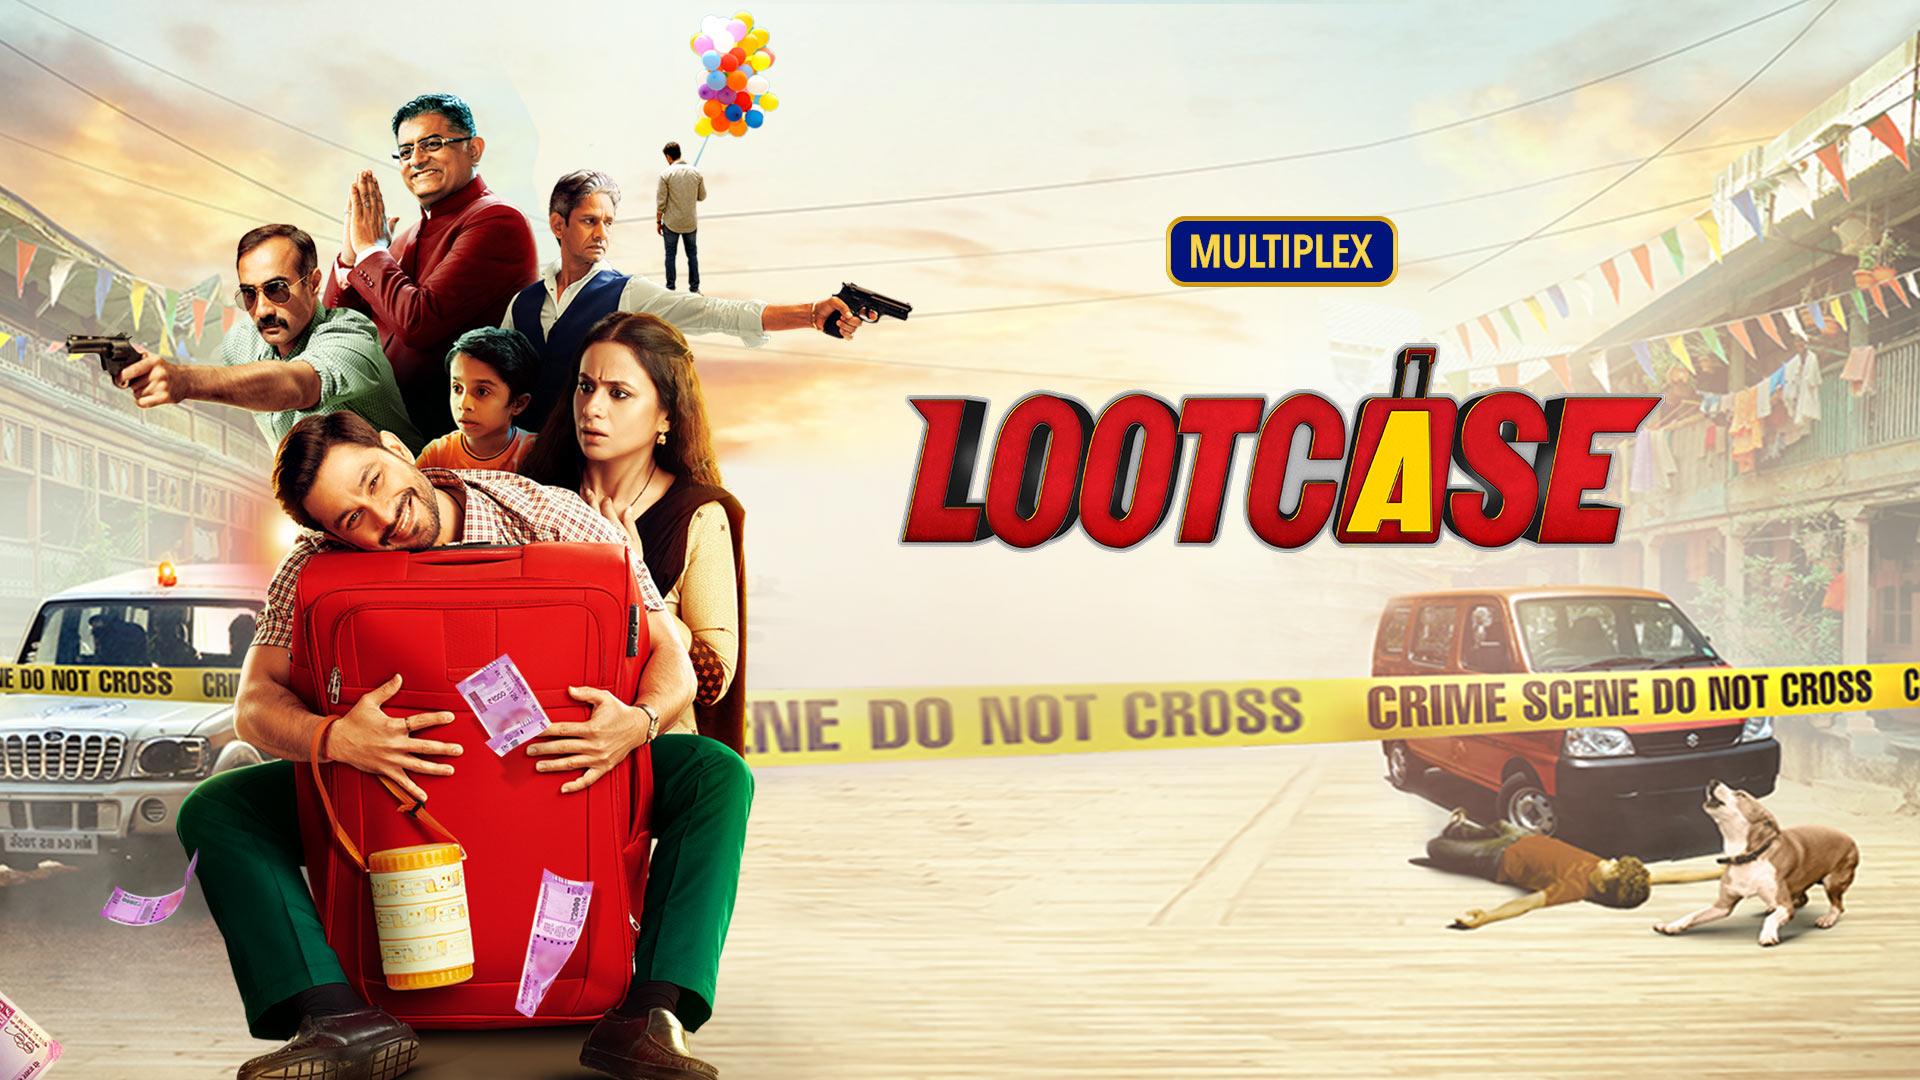 lootcase 2020 download